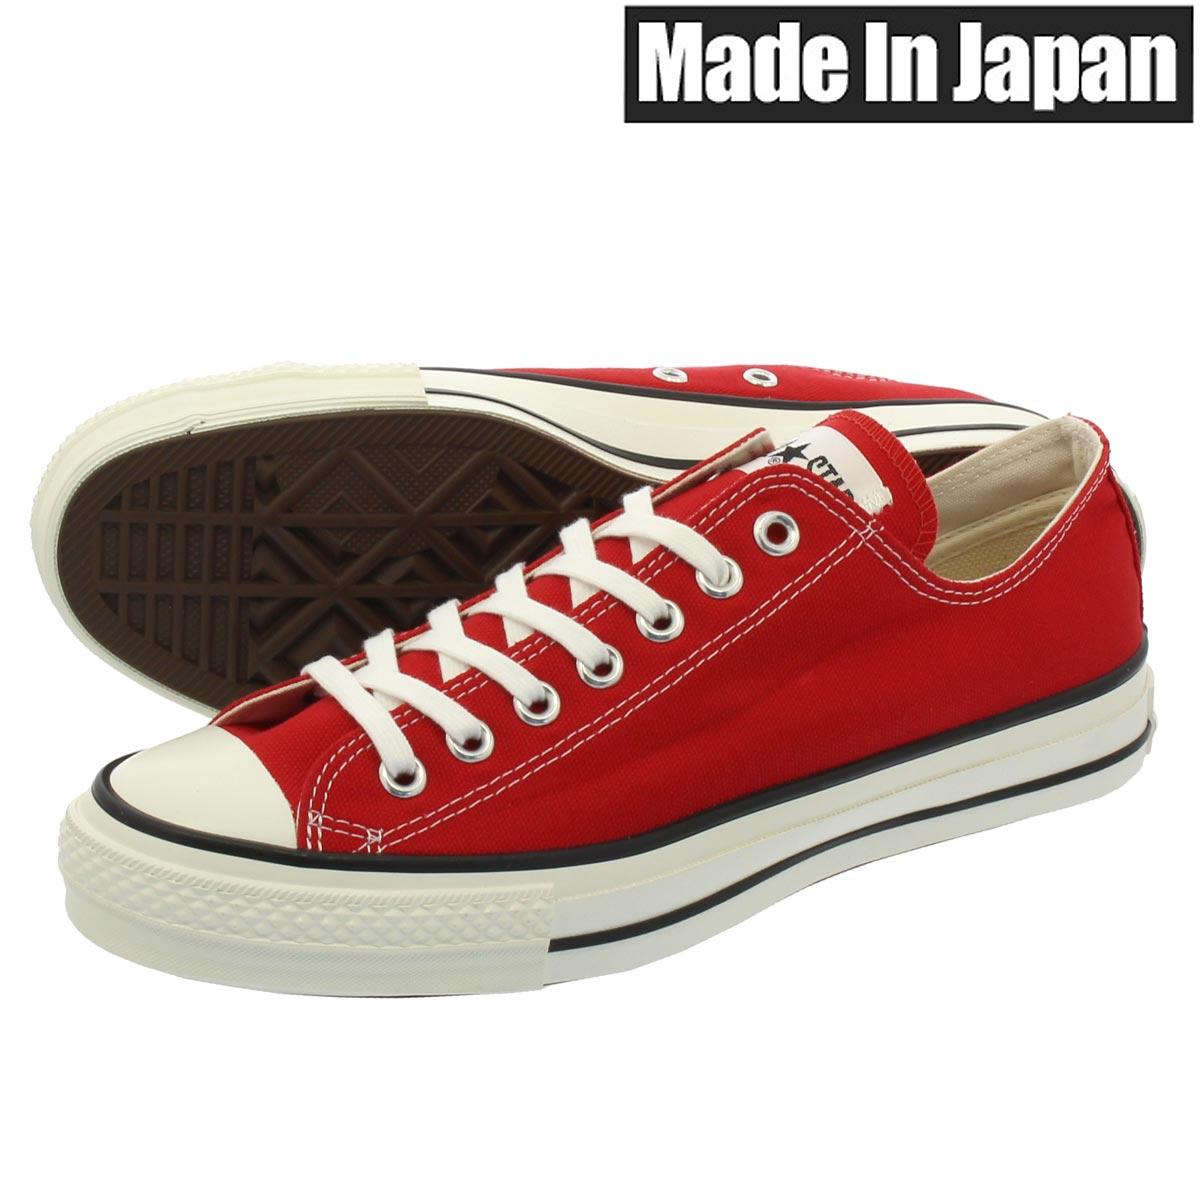 CONVERSE ALLSTAR J OX 【MADE IN JAPAN】【日本製】 コンバース オールスター J OX RED